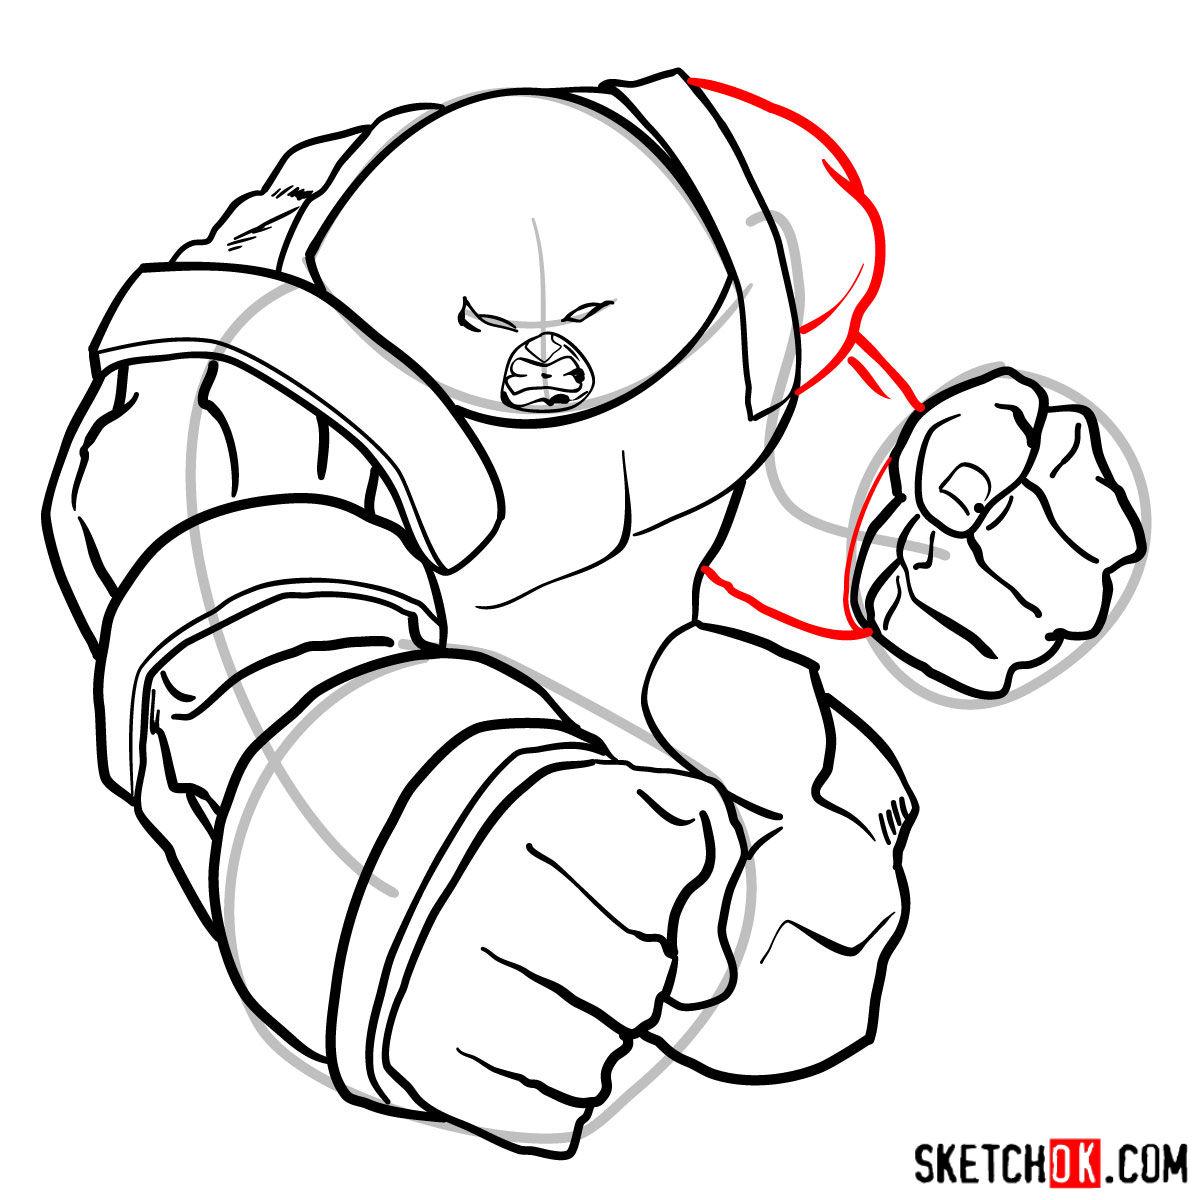 How to draw Juggernaut, the villian from X-Men series - step 12